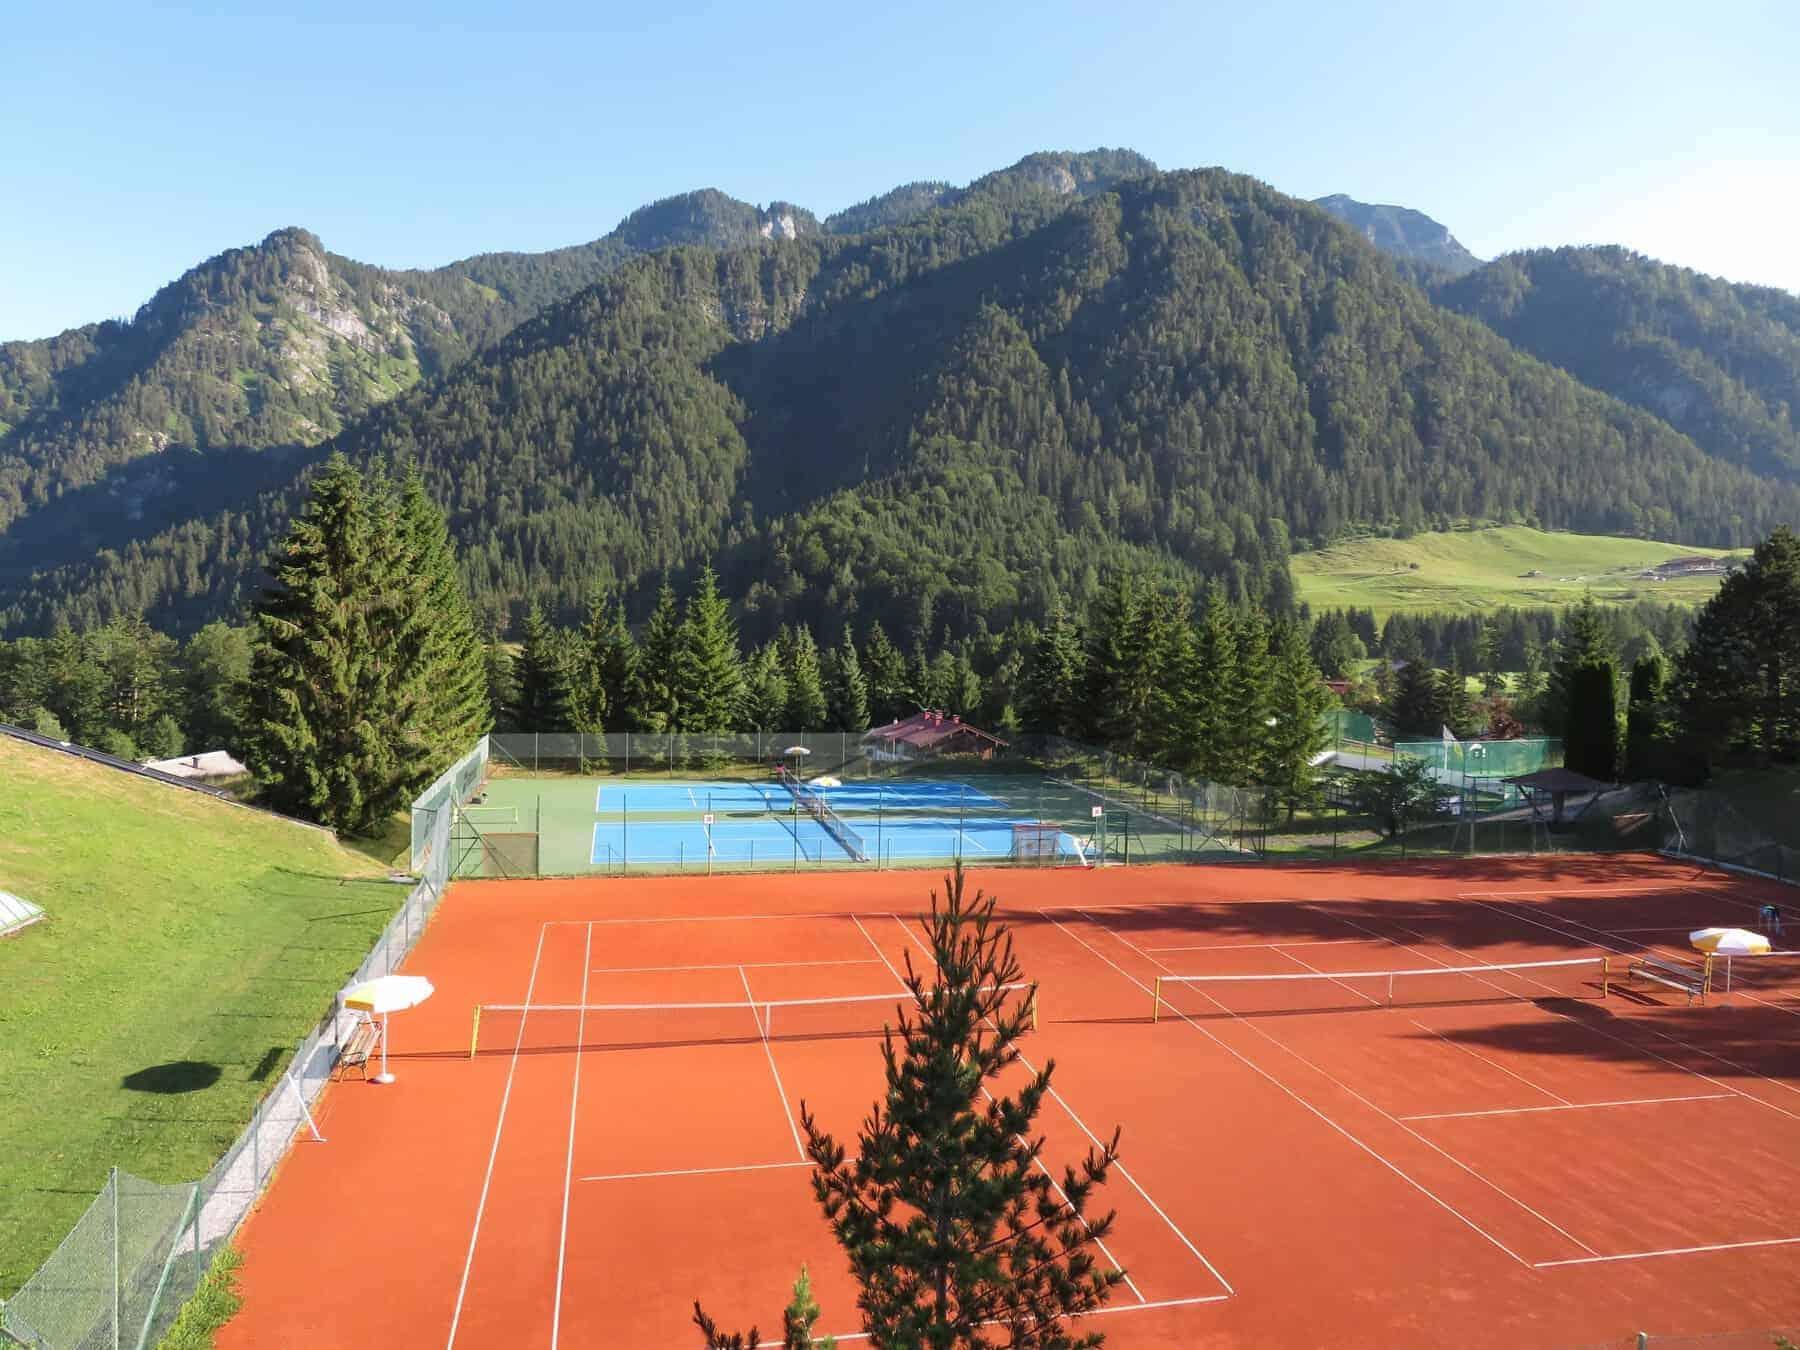 Laerchenhof indoors outdoors clay or hard court tennis